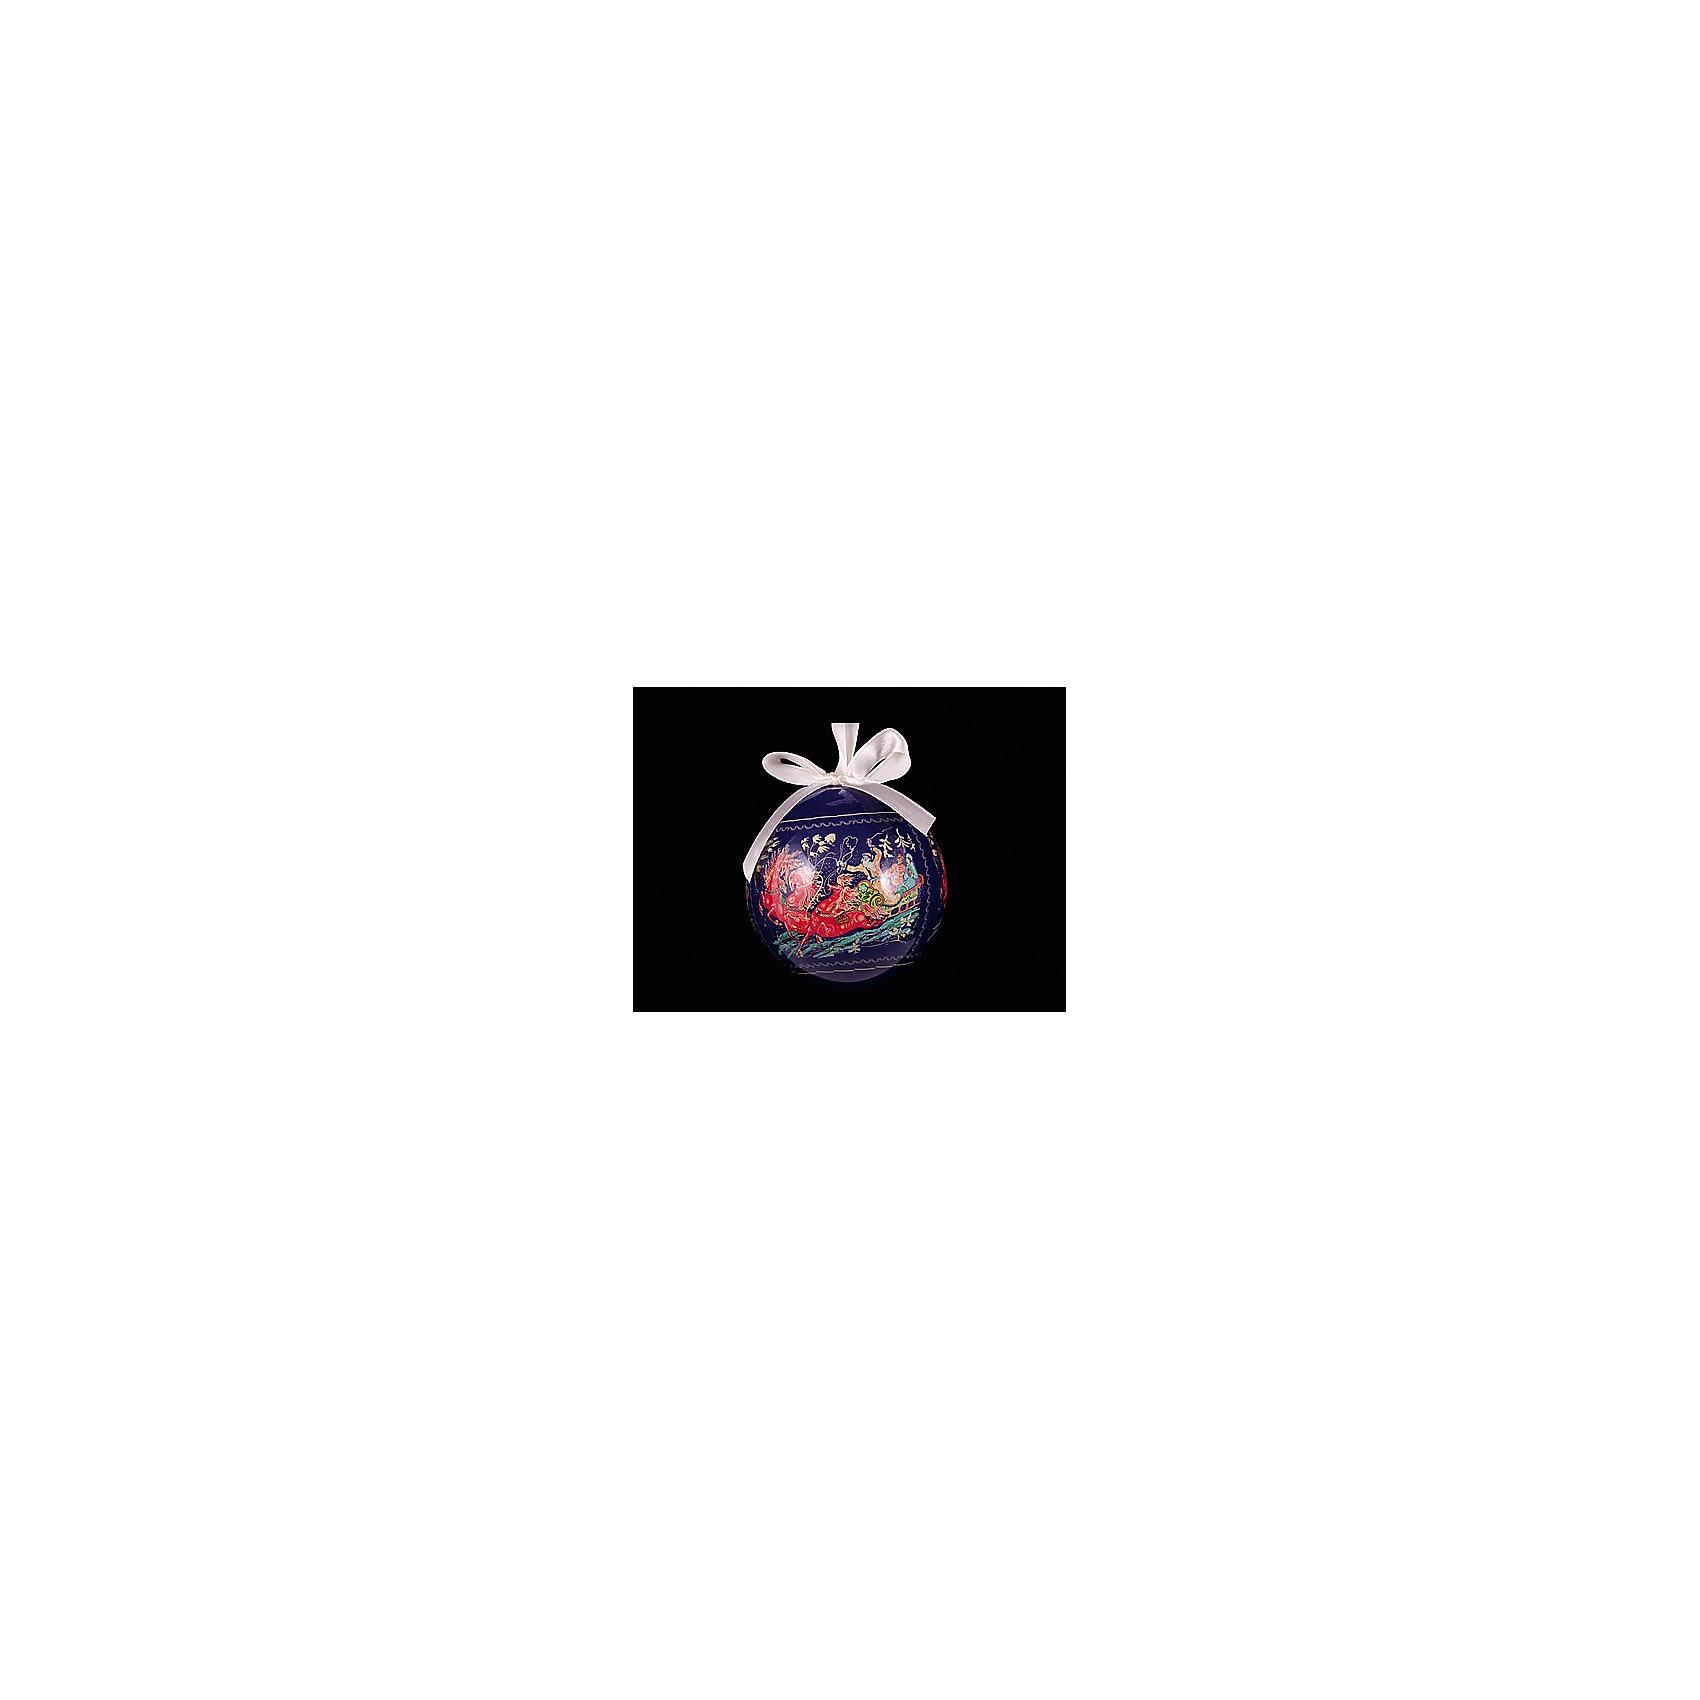 Marko Ferenzo Украшение шар Подарок 7,5 см елочное украшение носок marko ferenzo